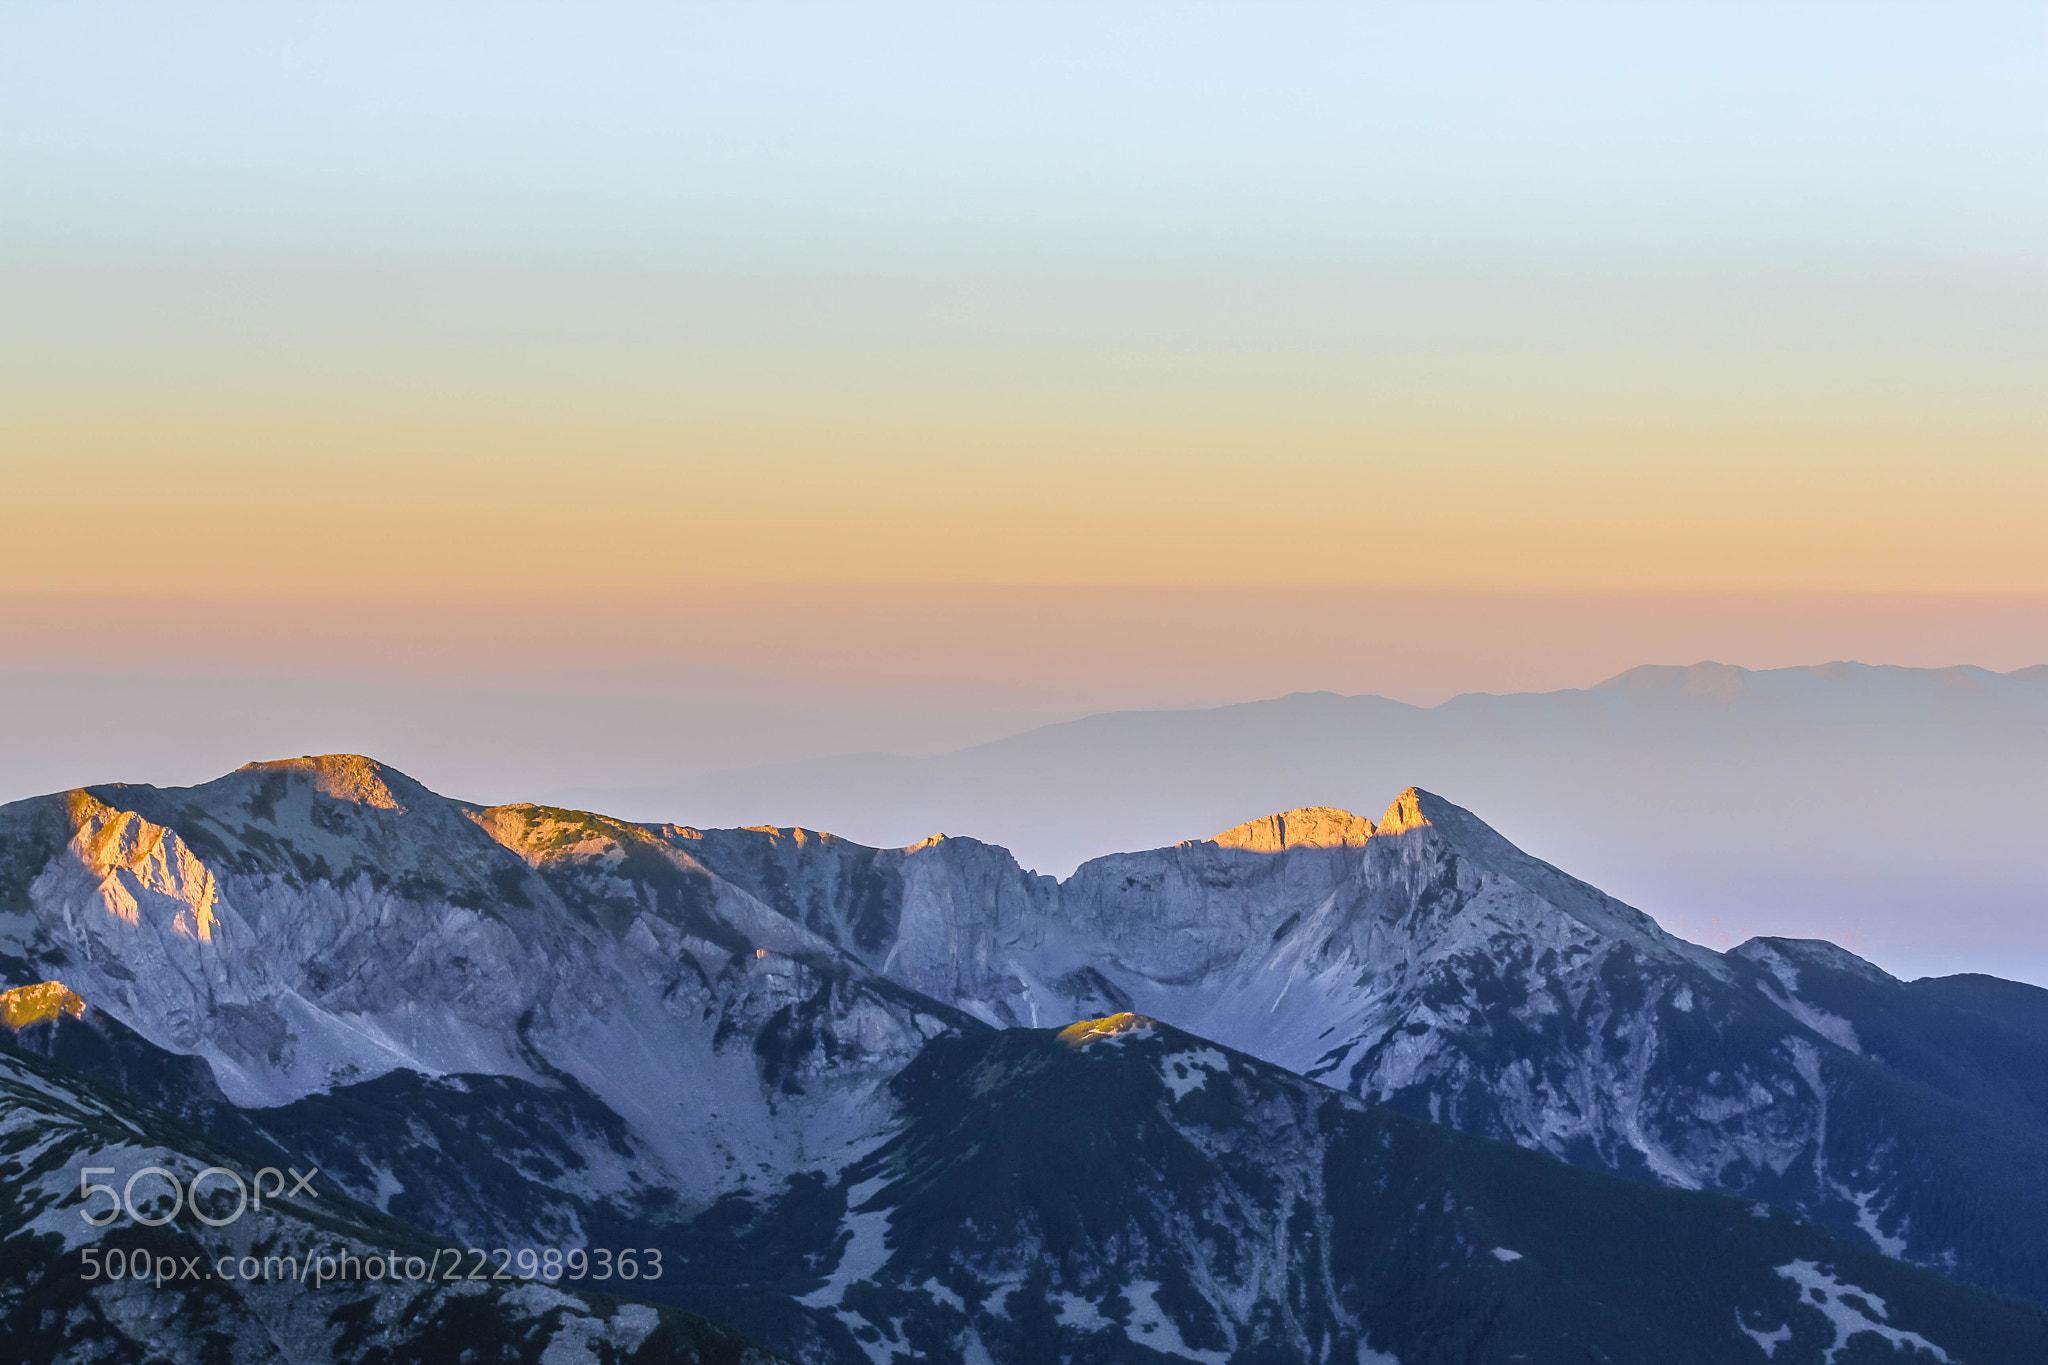 Sunrise over Pirin, Bulgaria